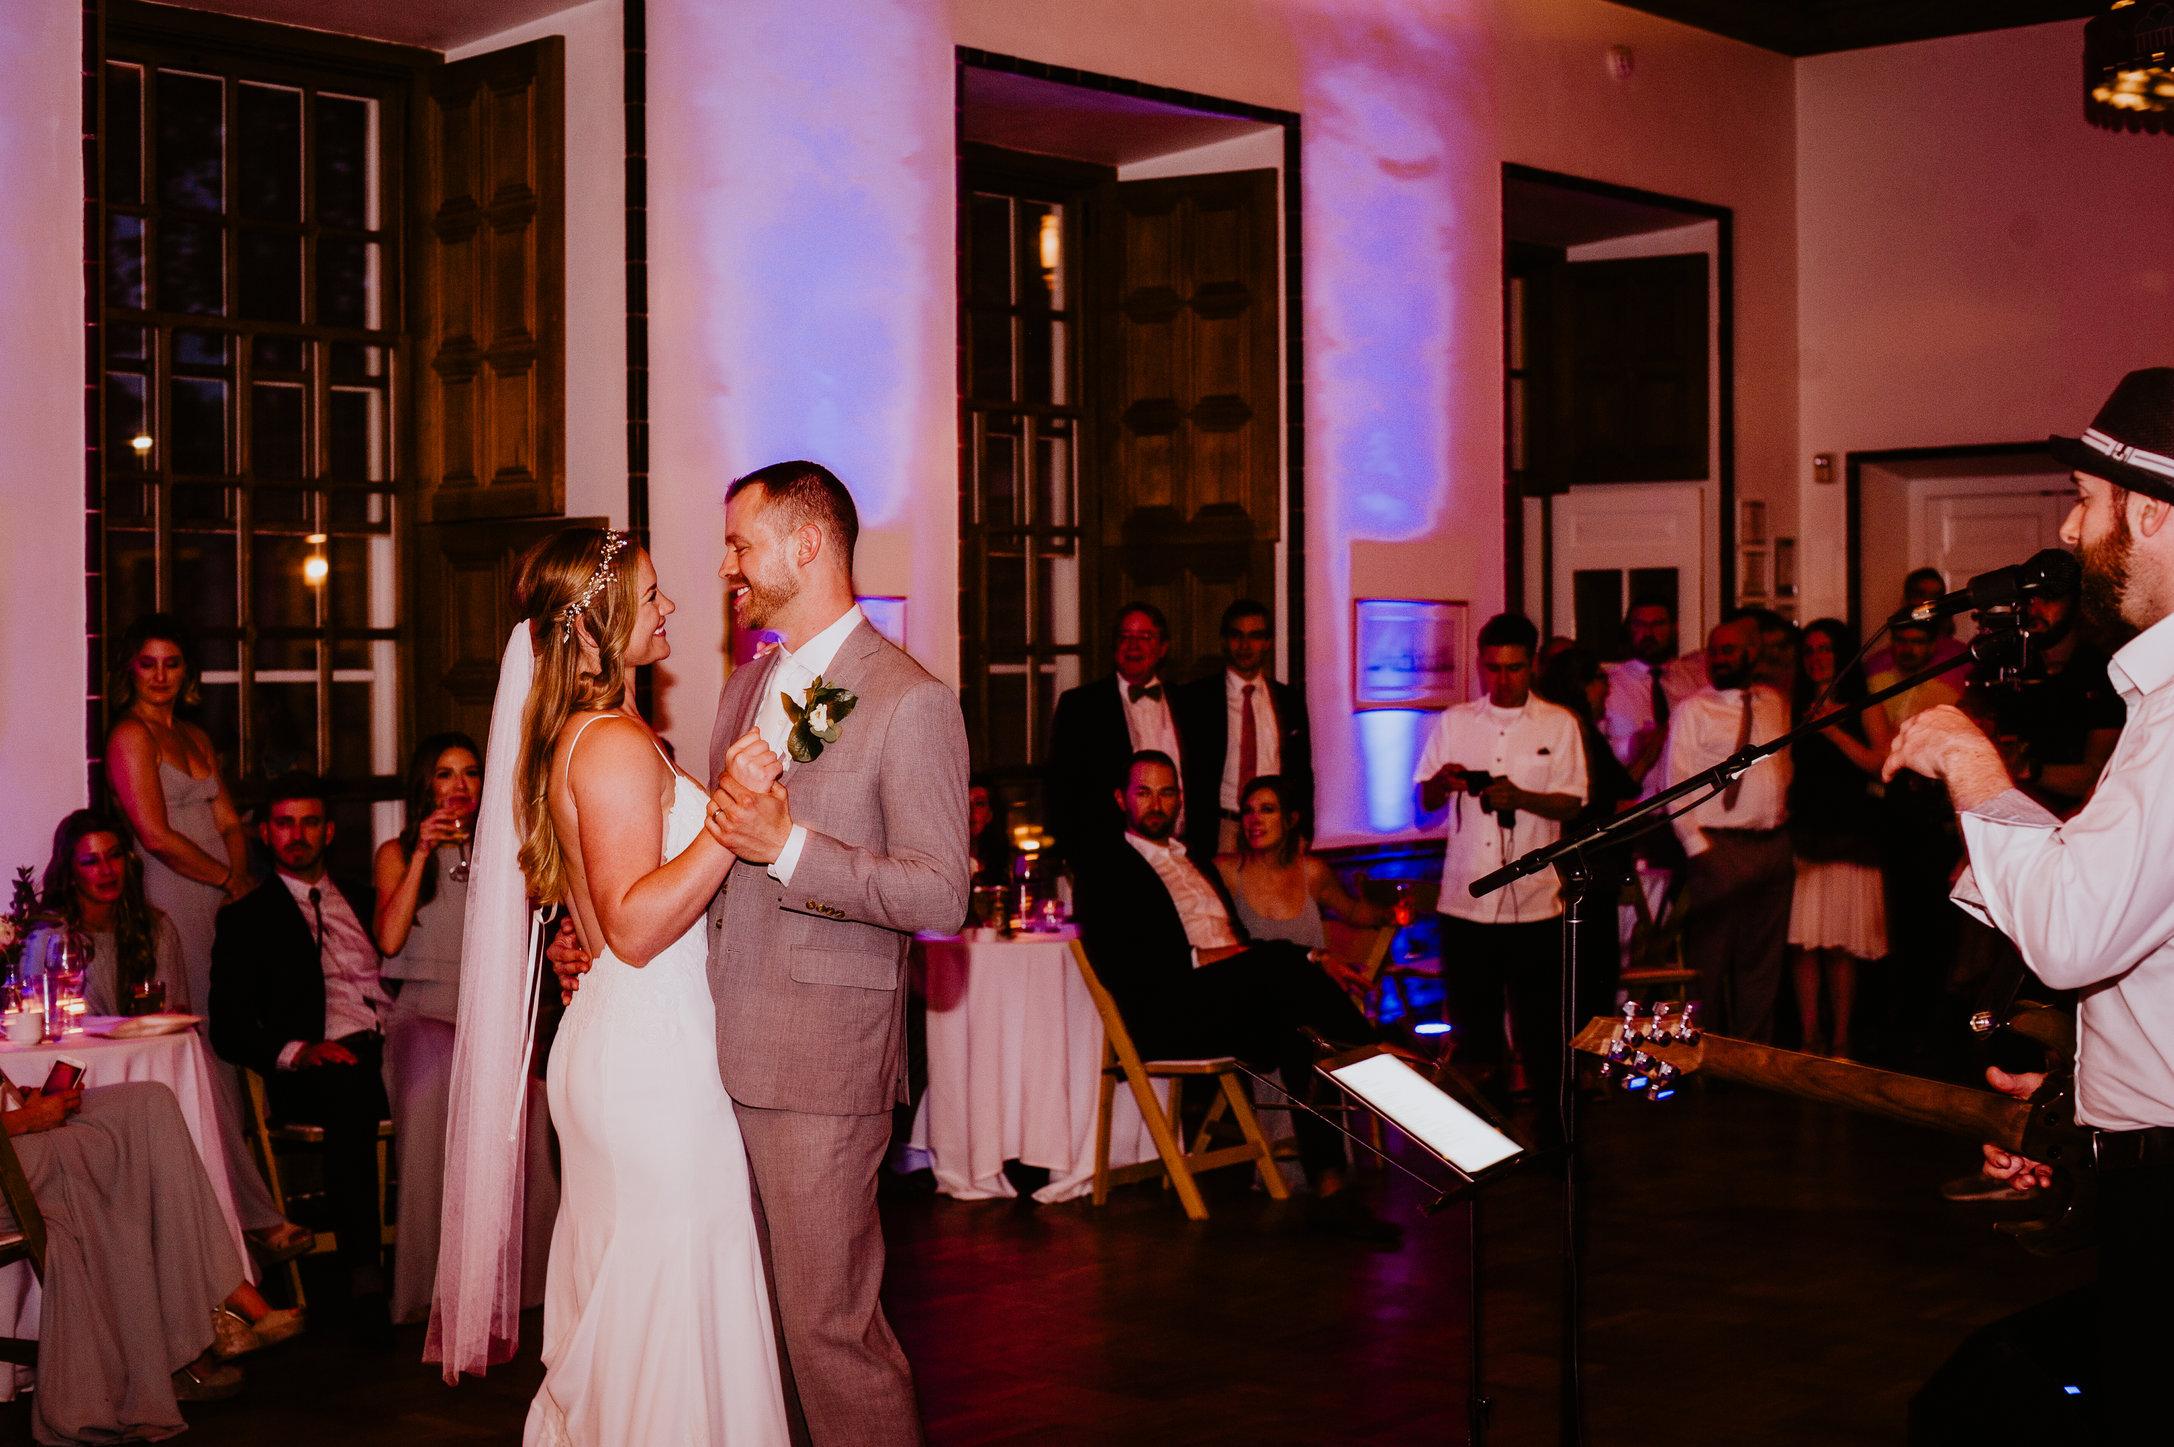 DandA-wedding-791.jpg